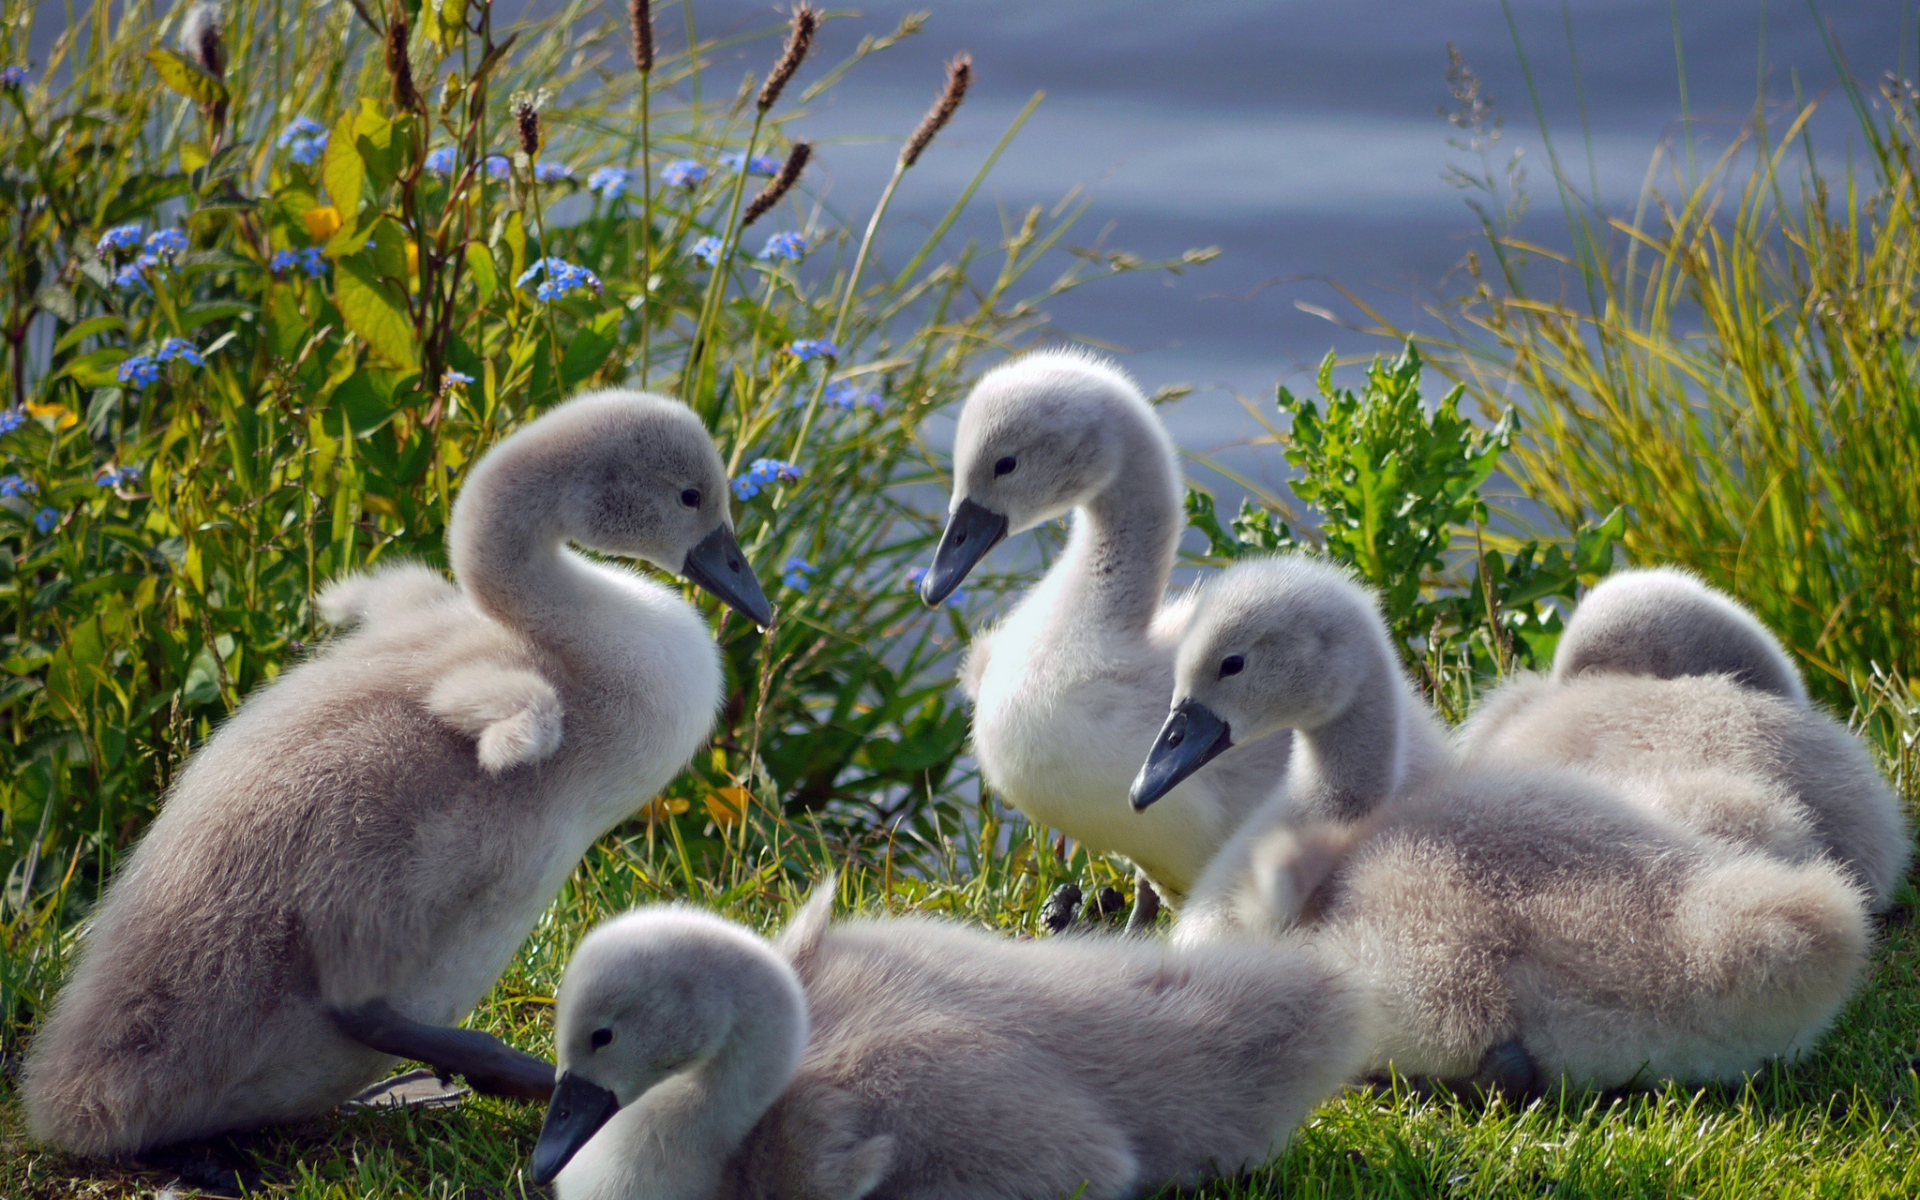 Картинки Лебеди, утки, трава, стадо, семья фото и обои на рабочий стол